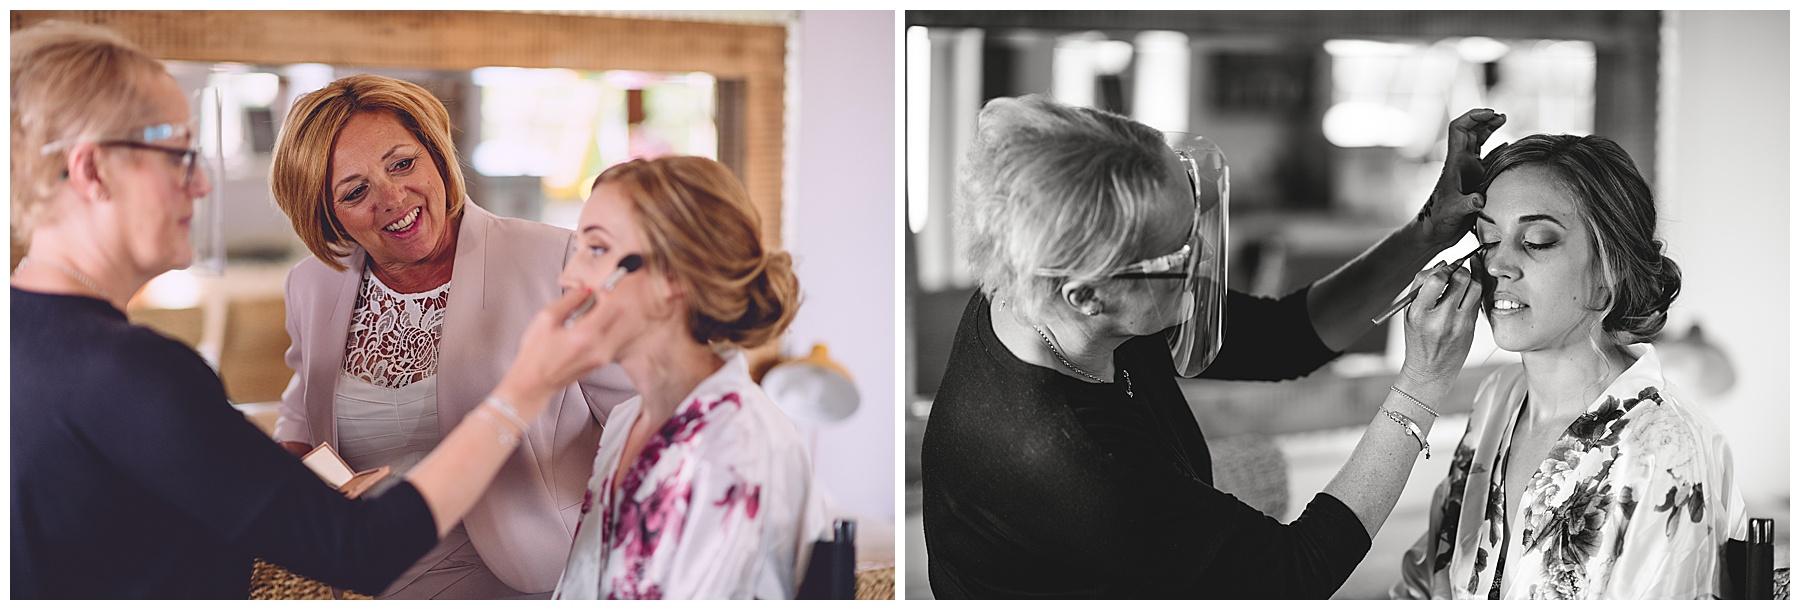 Bridal Makeup at Oldwalls